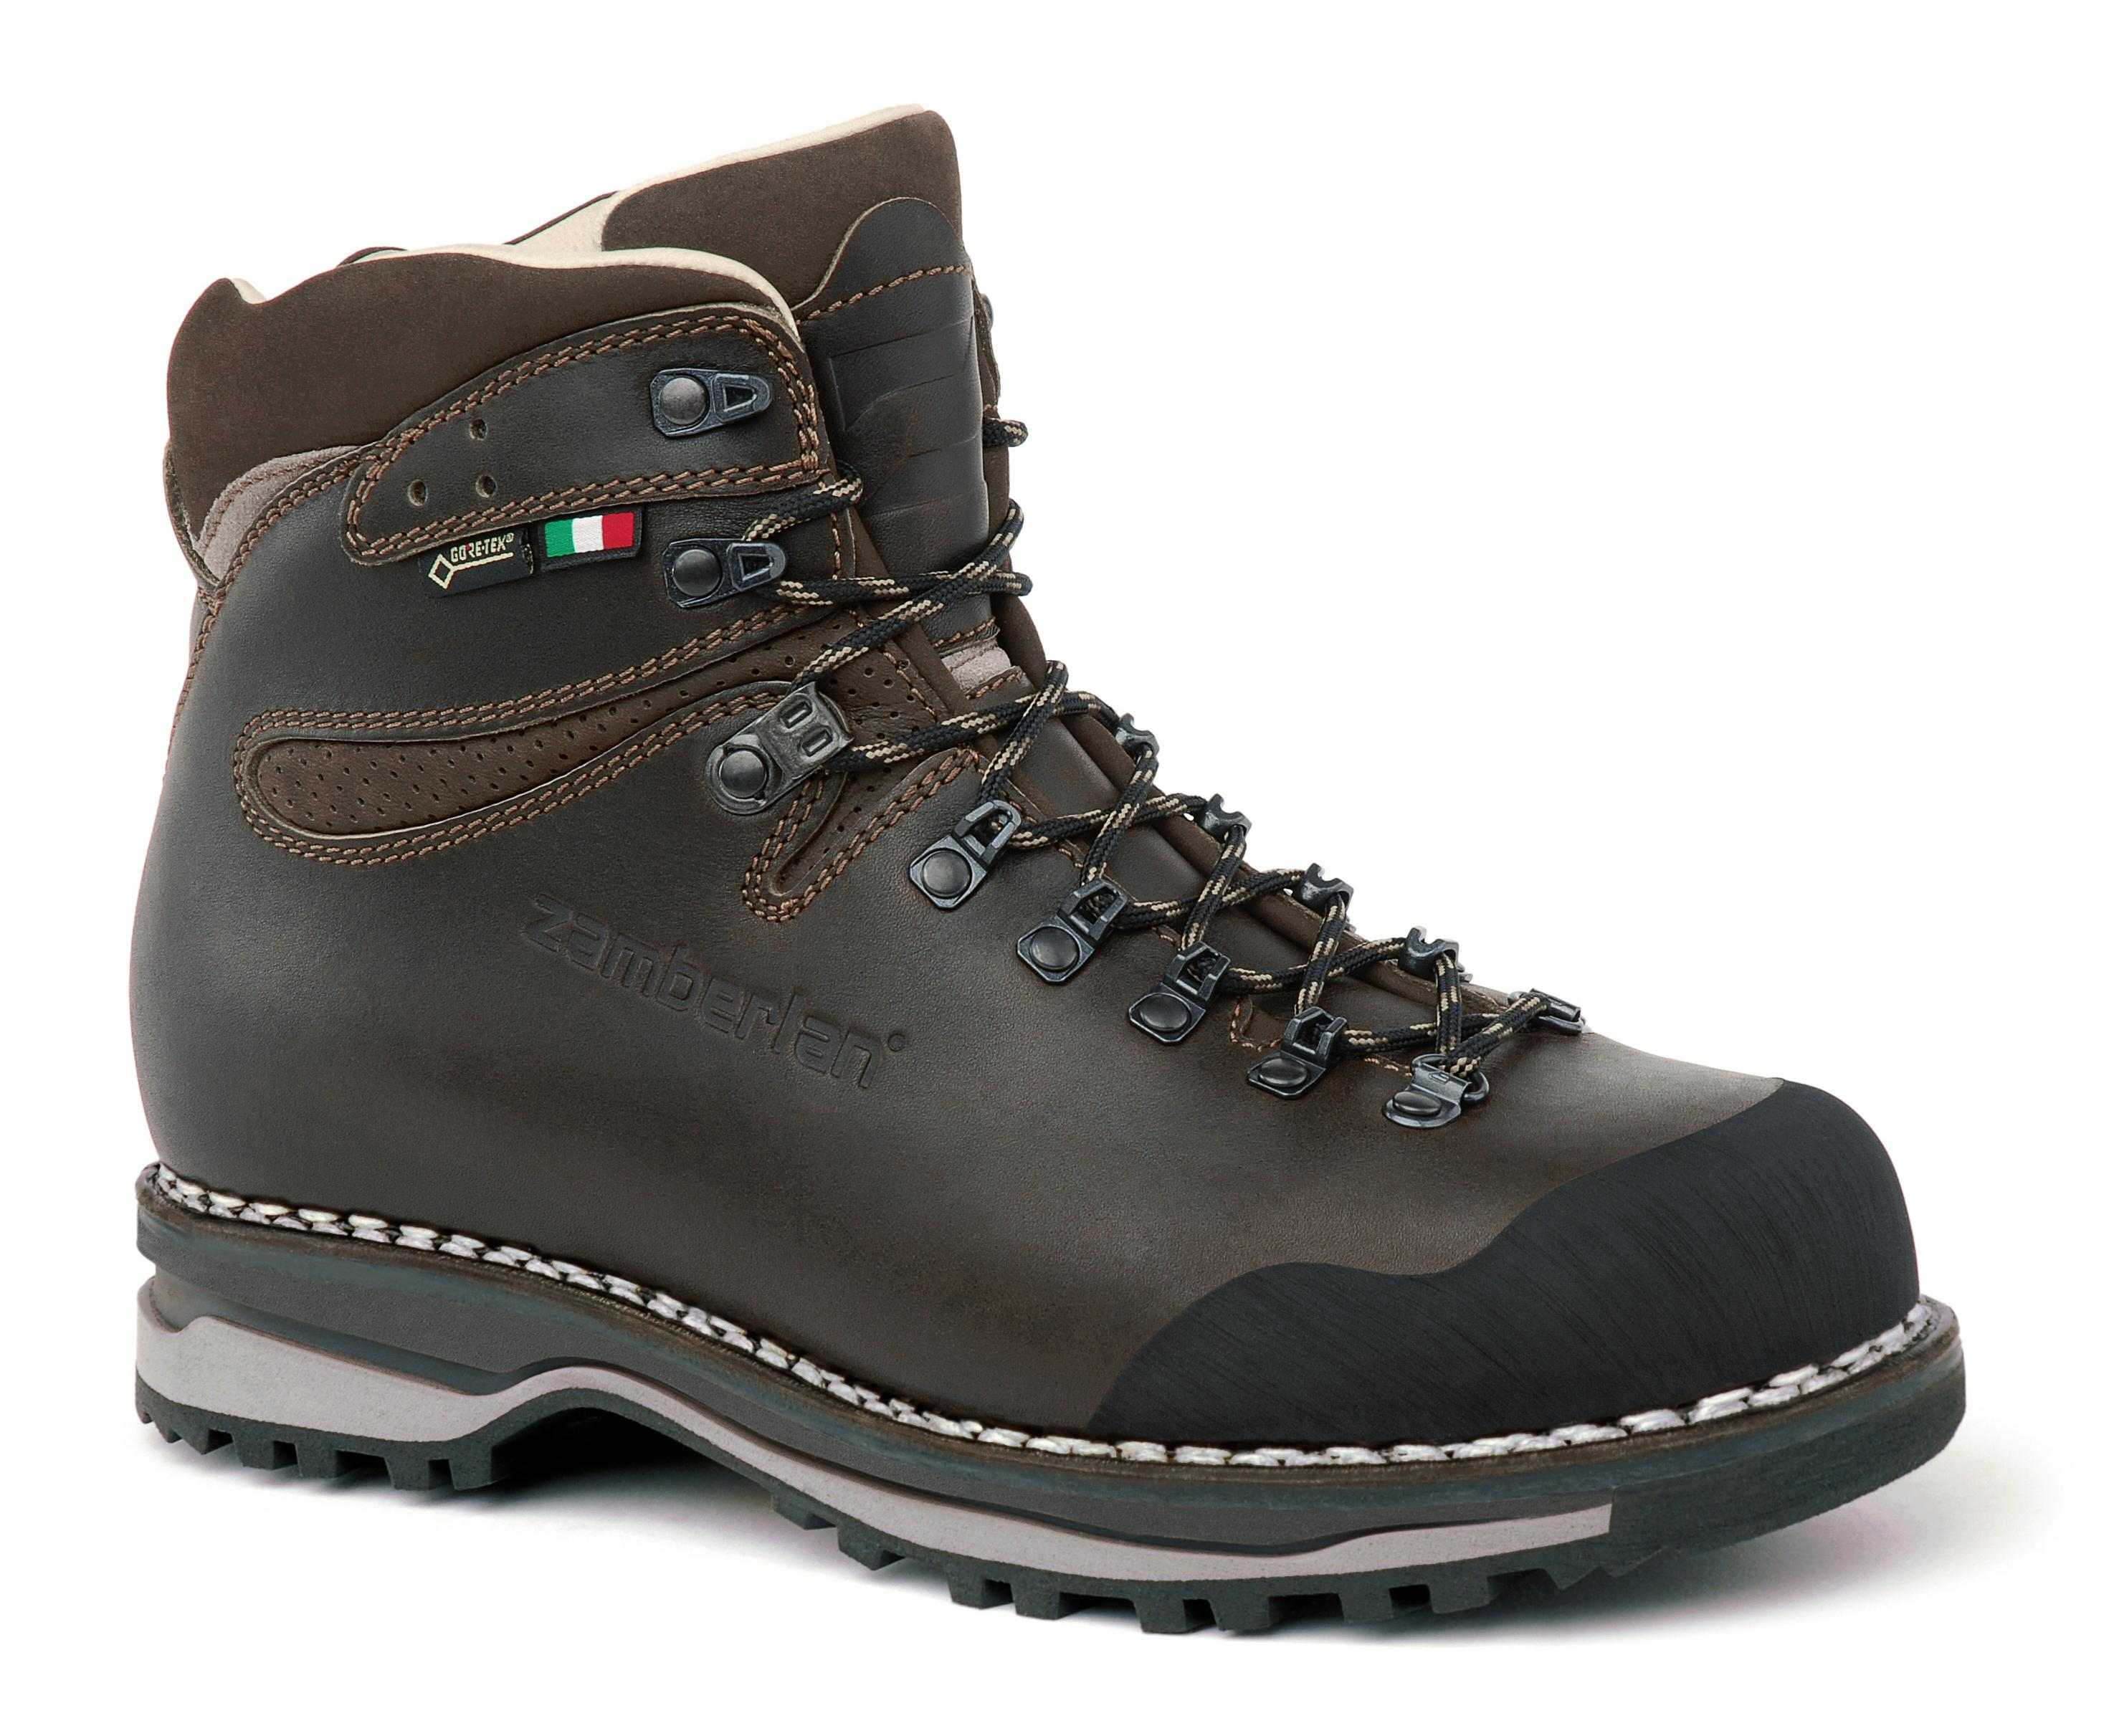 1025 TOFANE NW GTX® RR   -   Bottes  Trekking     -   Waxed Dark Brown